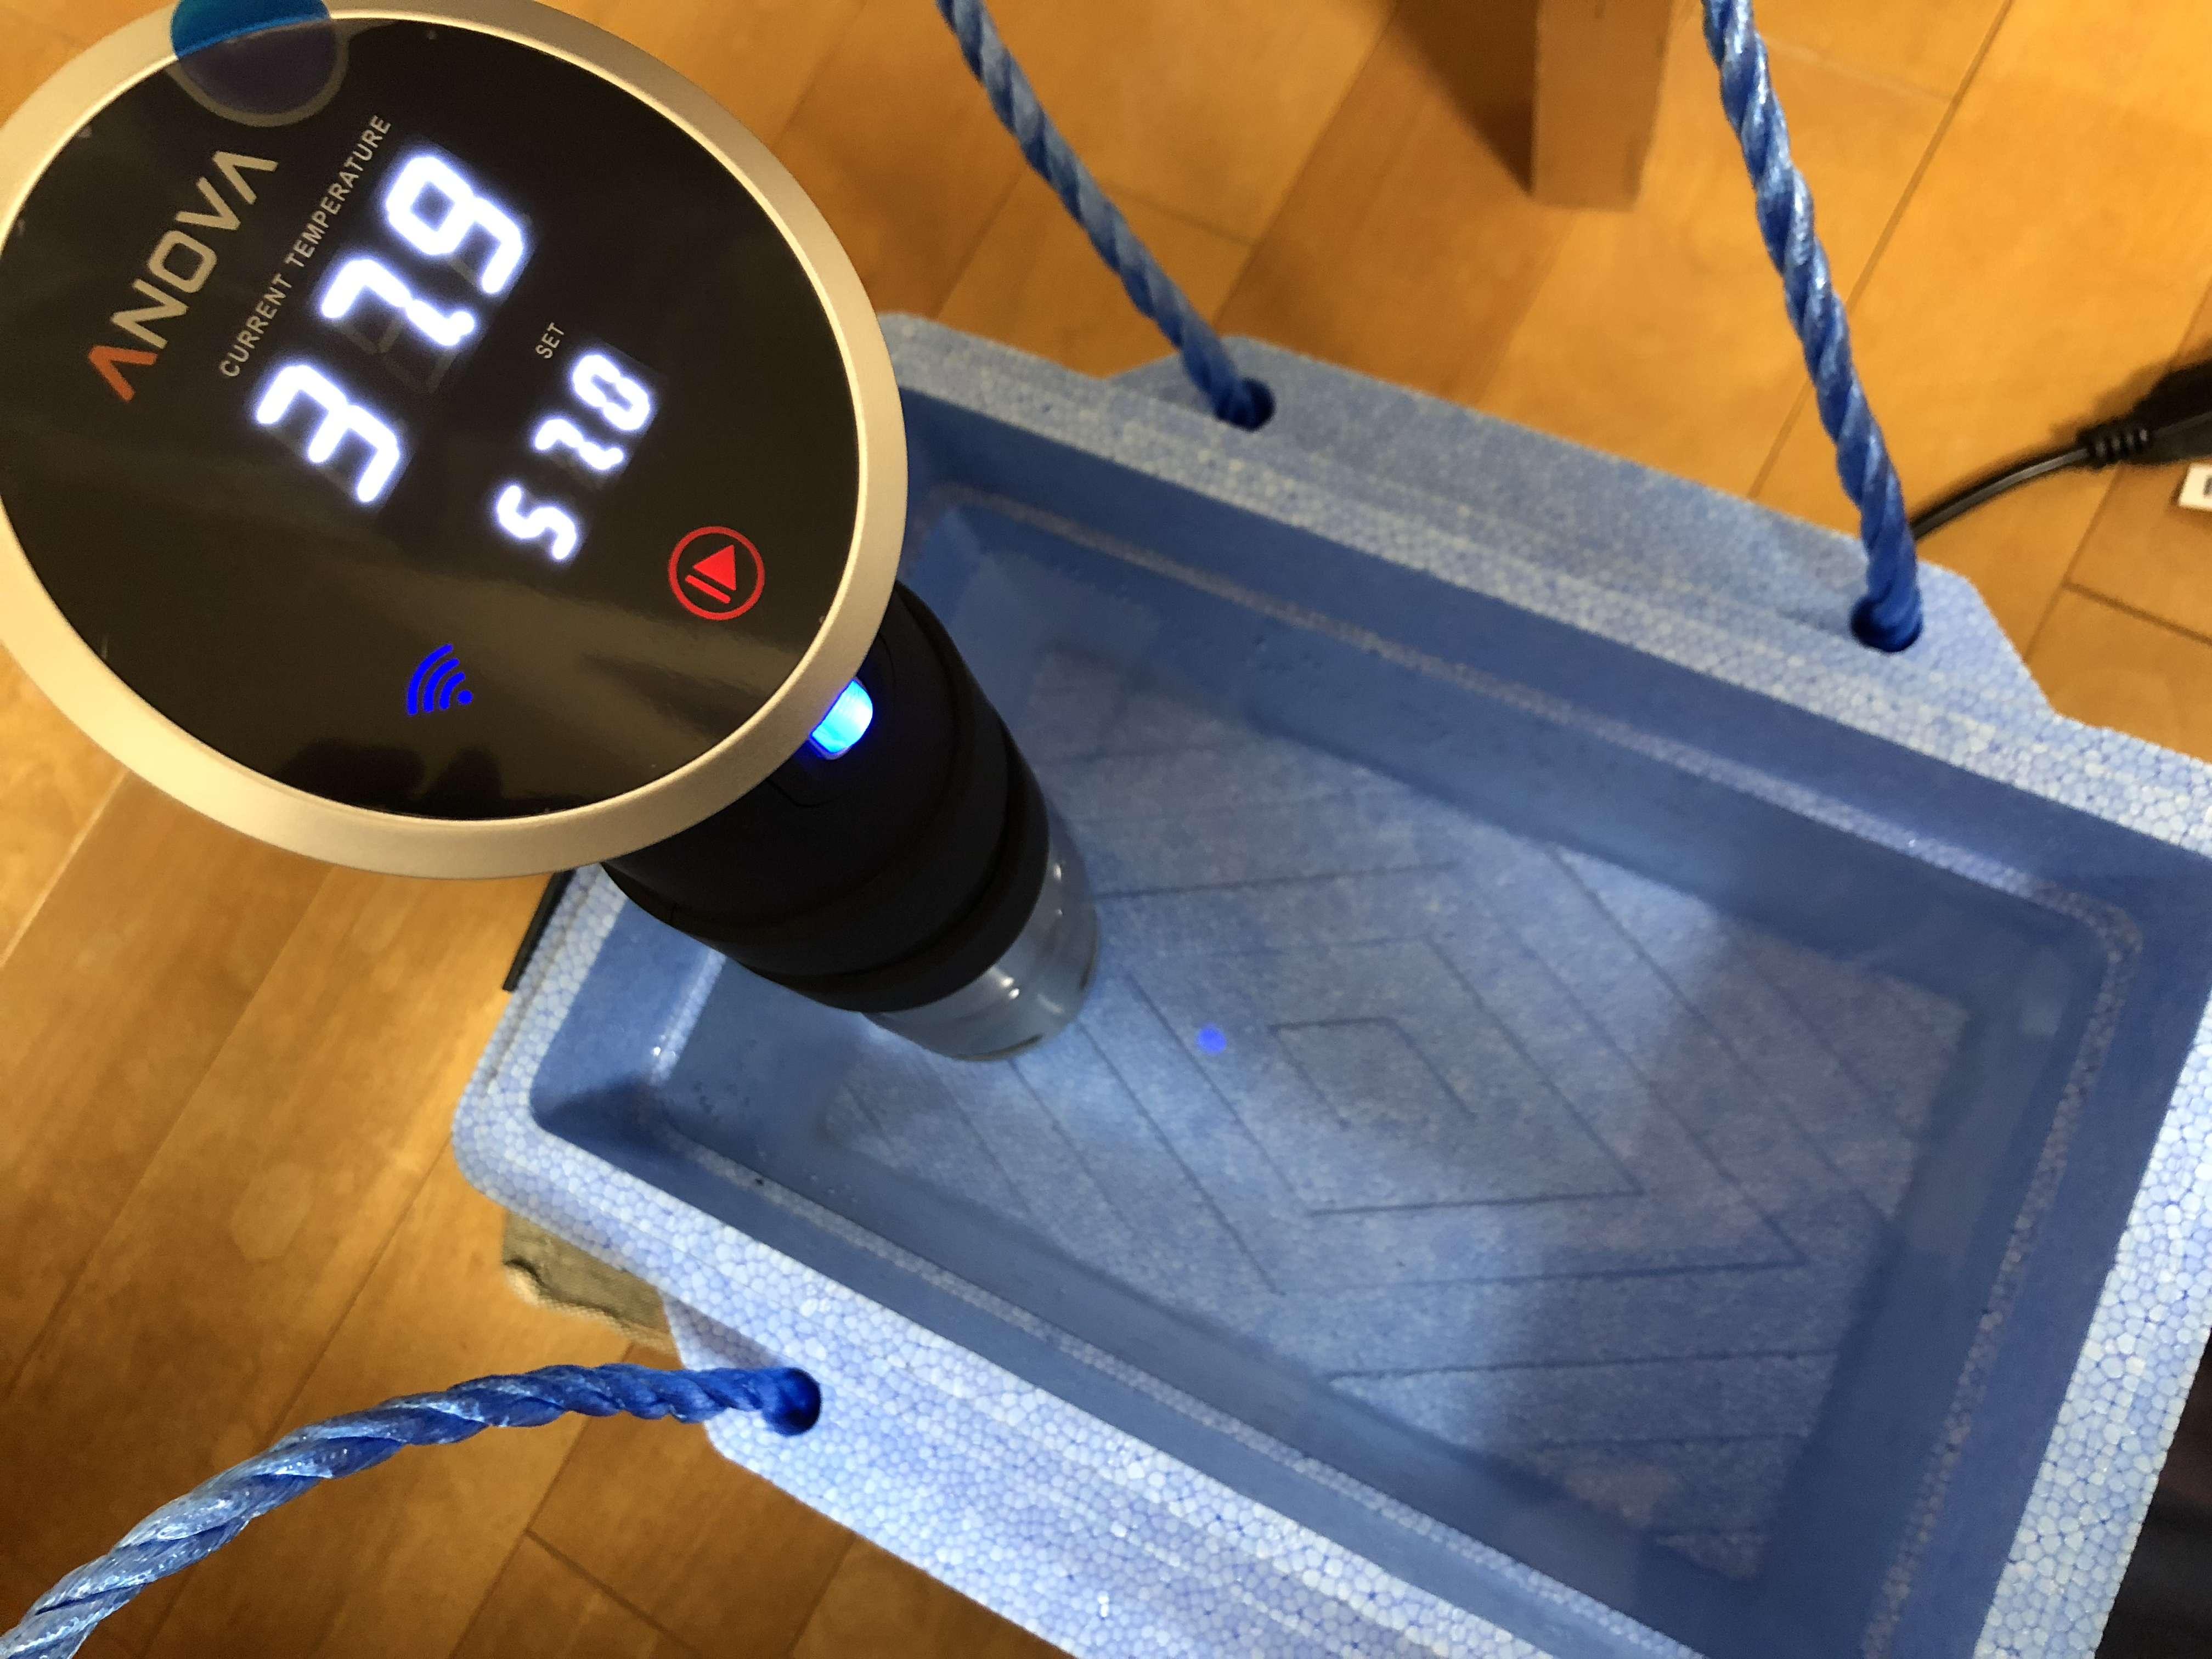 Anova アノーバ 低温調理器 レビュー 使い方 ローストビーフ 57℃ 3時間